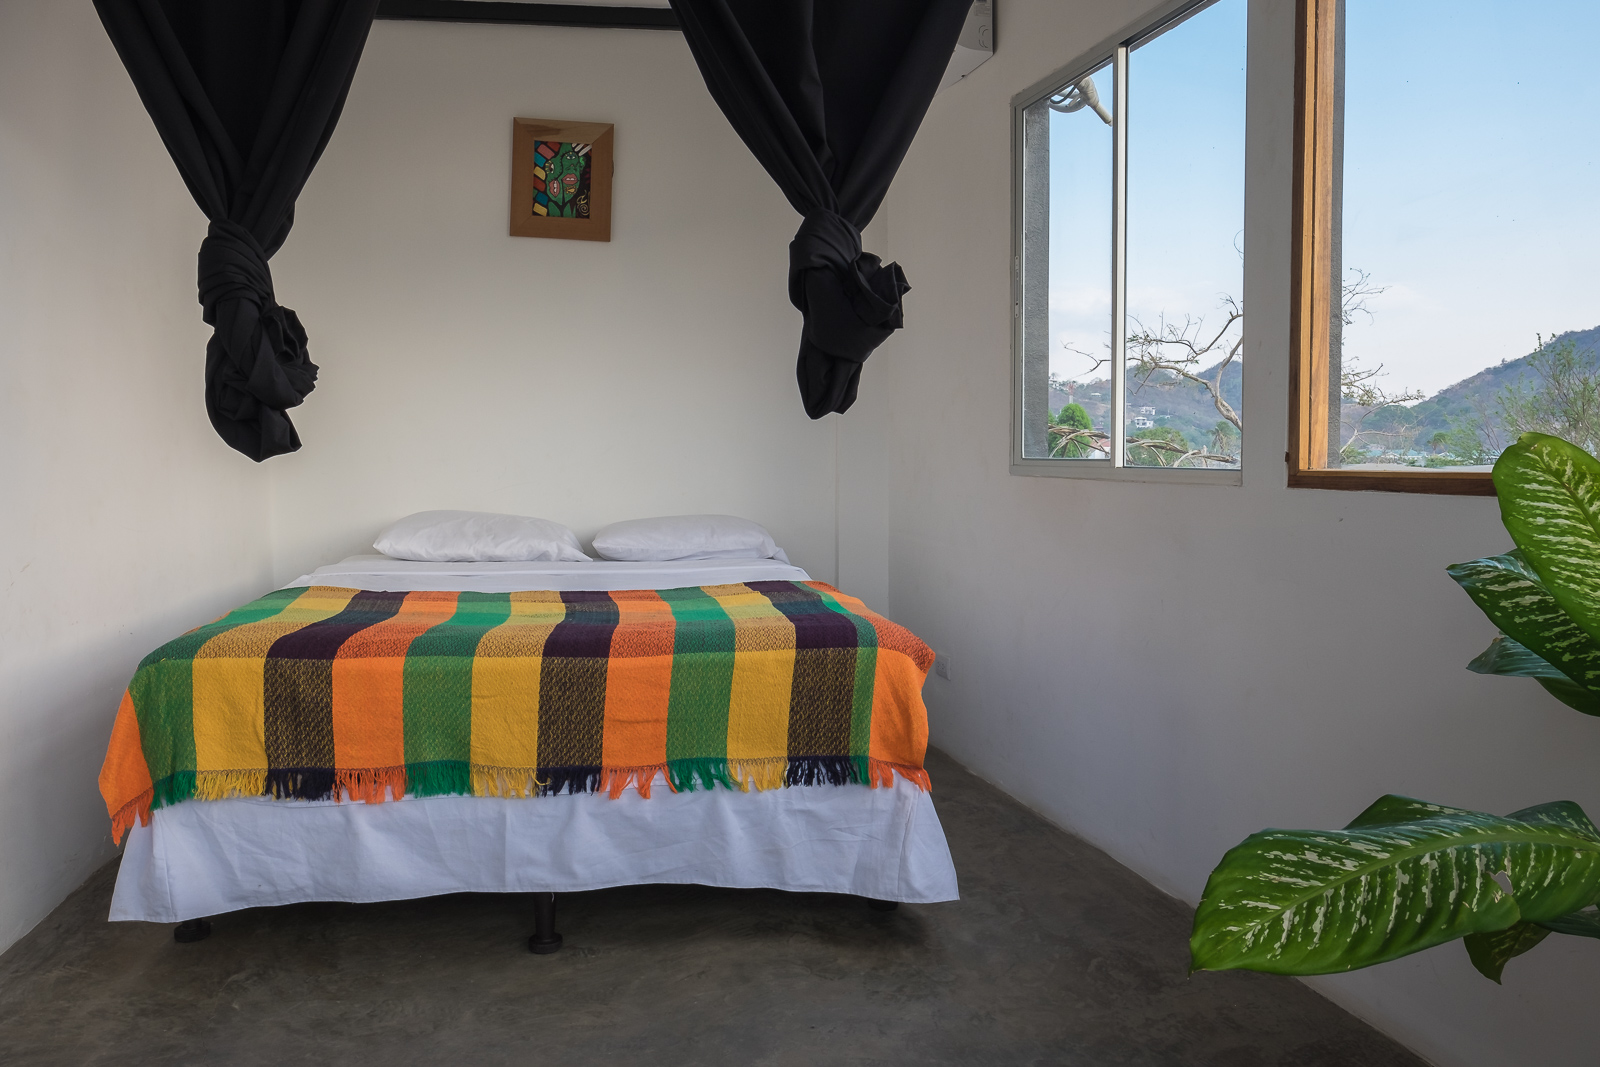 Property for sale in San Juan Del Sur Nicaragua, Social House 10.jpg